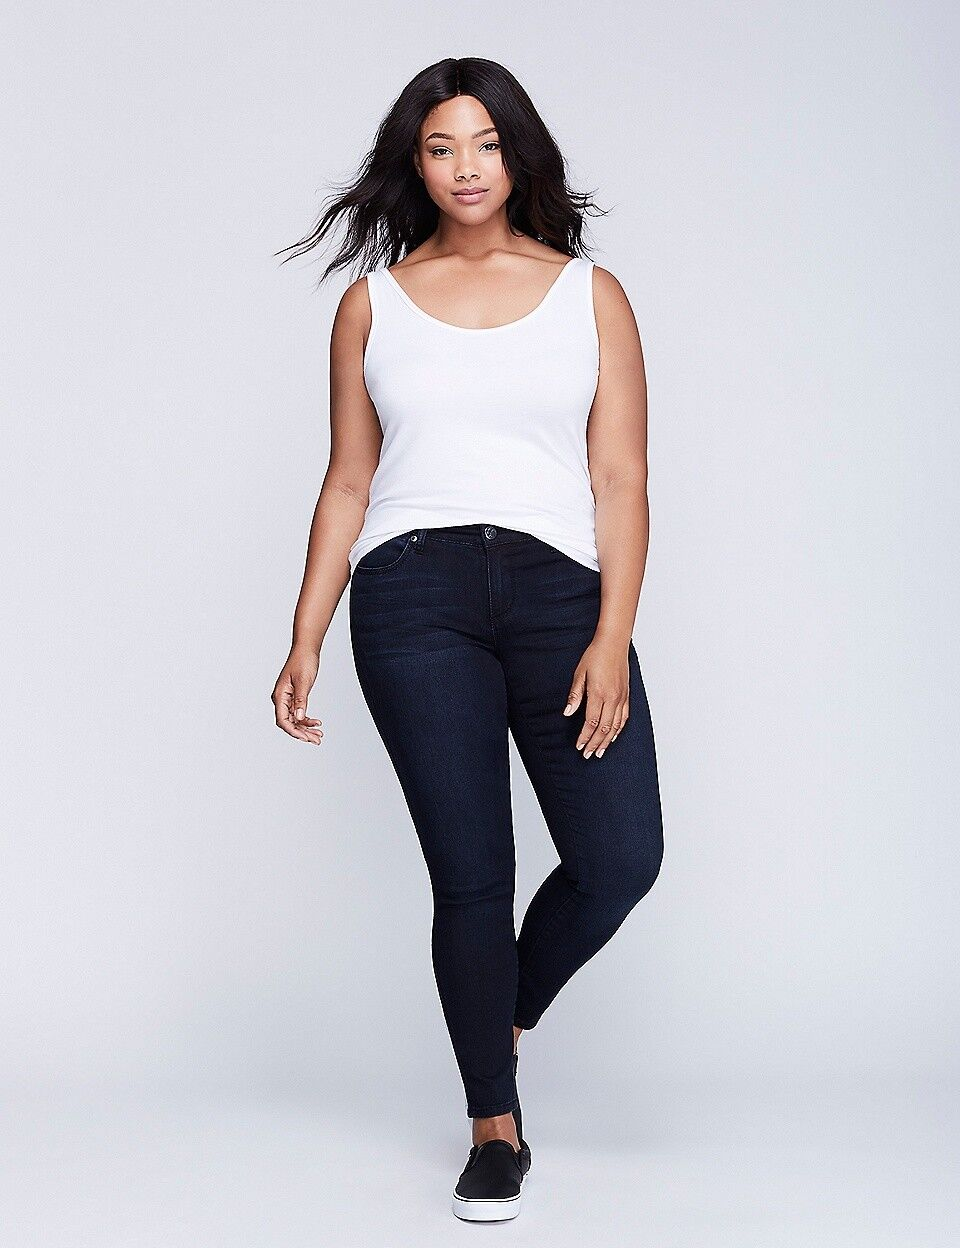 Seven 7 Melissa McCarthy Dark SKINNY Denim Leggings Jeans PLUS Sz 16 Lane Bryant